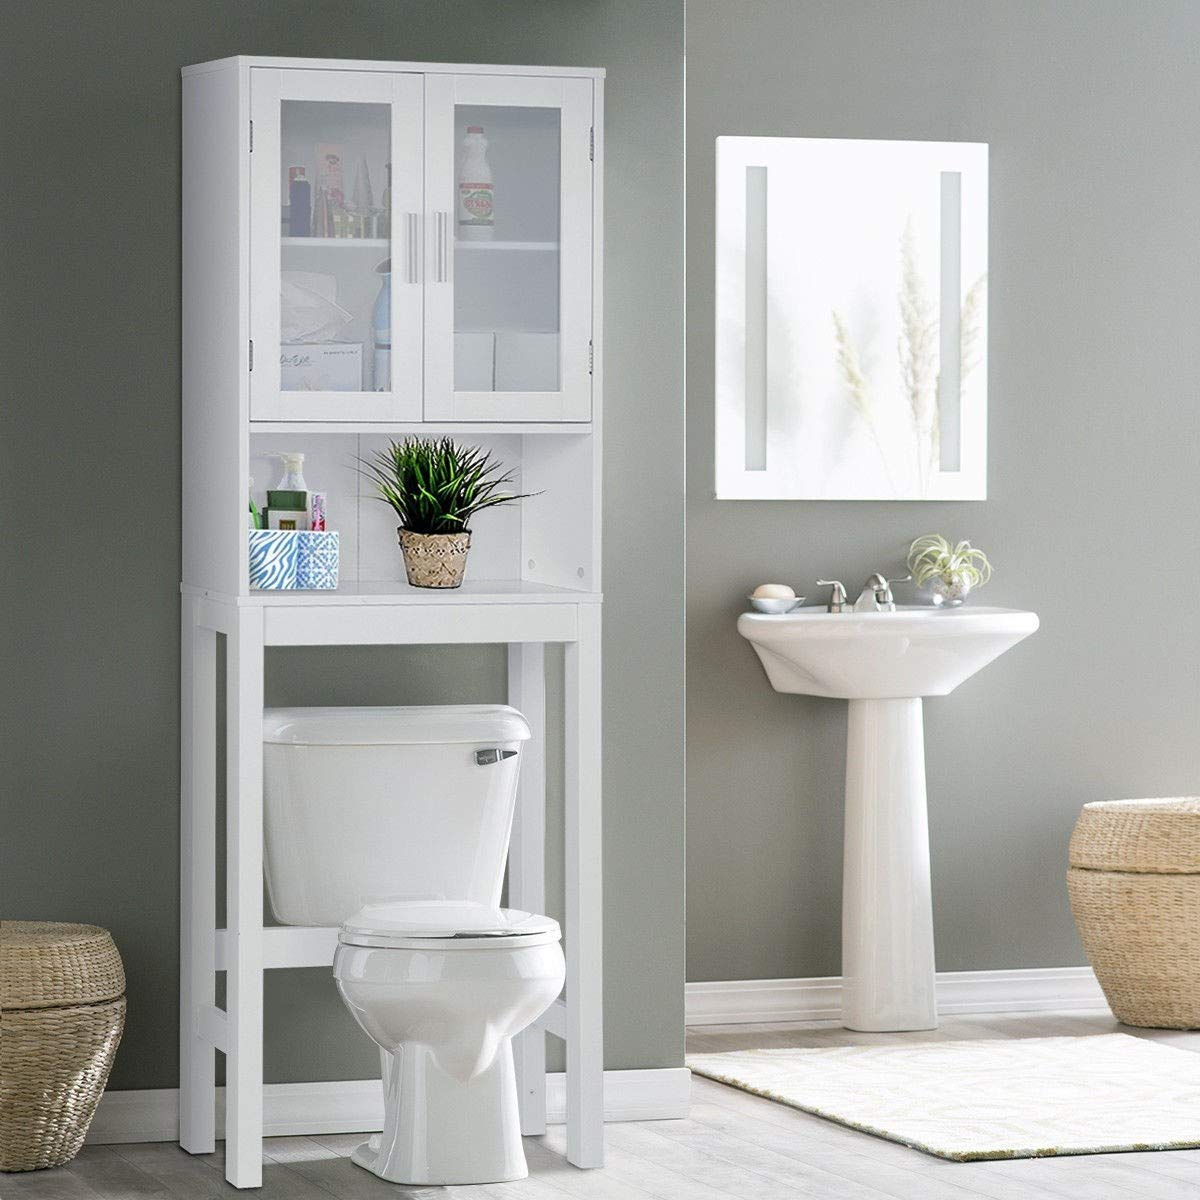 Amazoncom Bestcomfort Wooden Over The Toilet Cabinet Storage